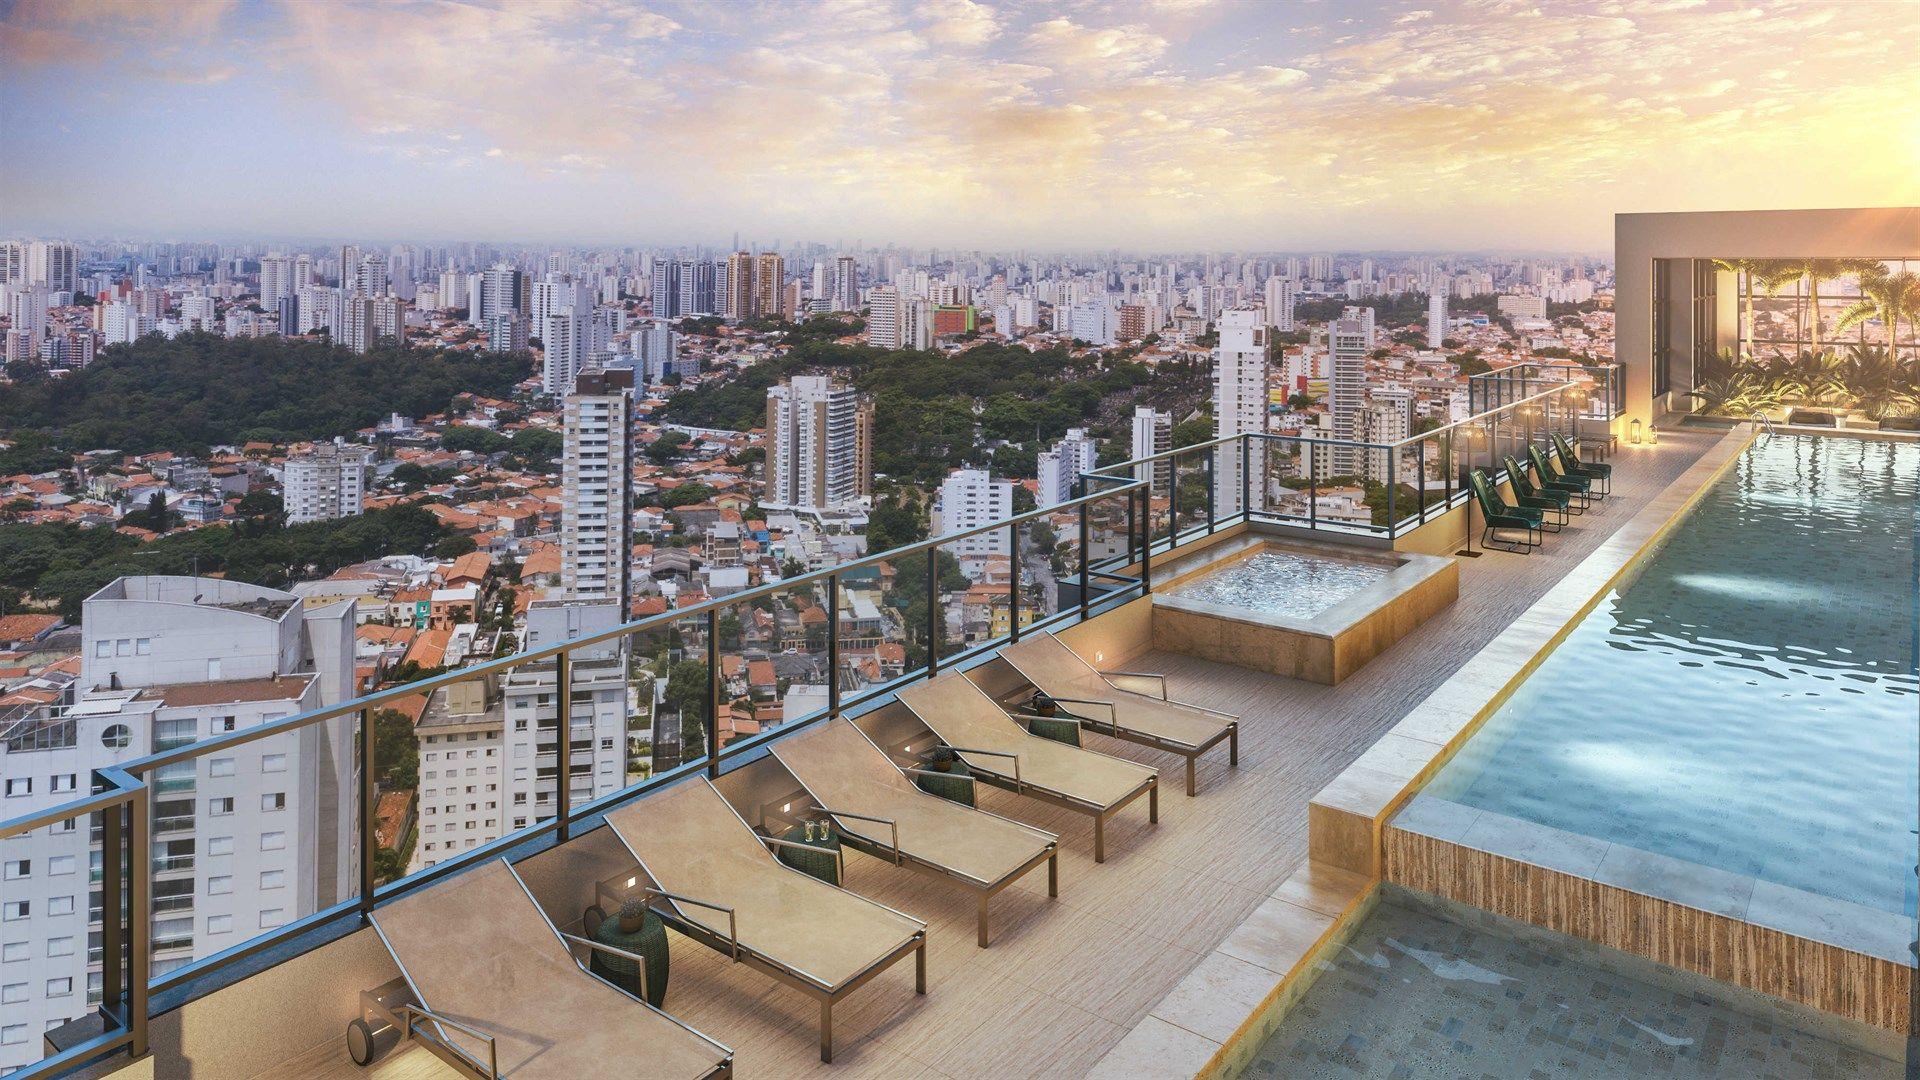 Atmosfera Vila Mariana- Atendimento Especializado - (11) 4116-9995 | 98026-0864